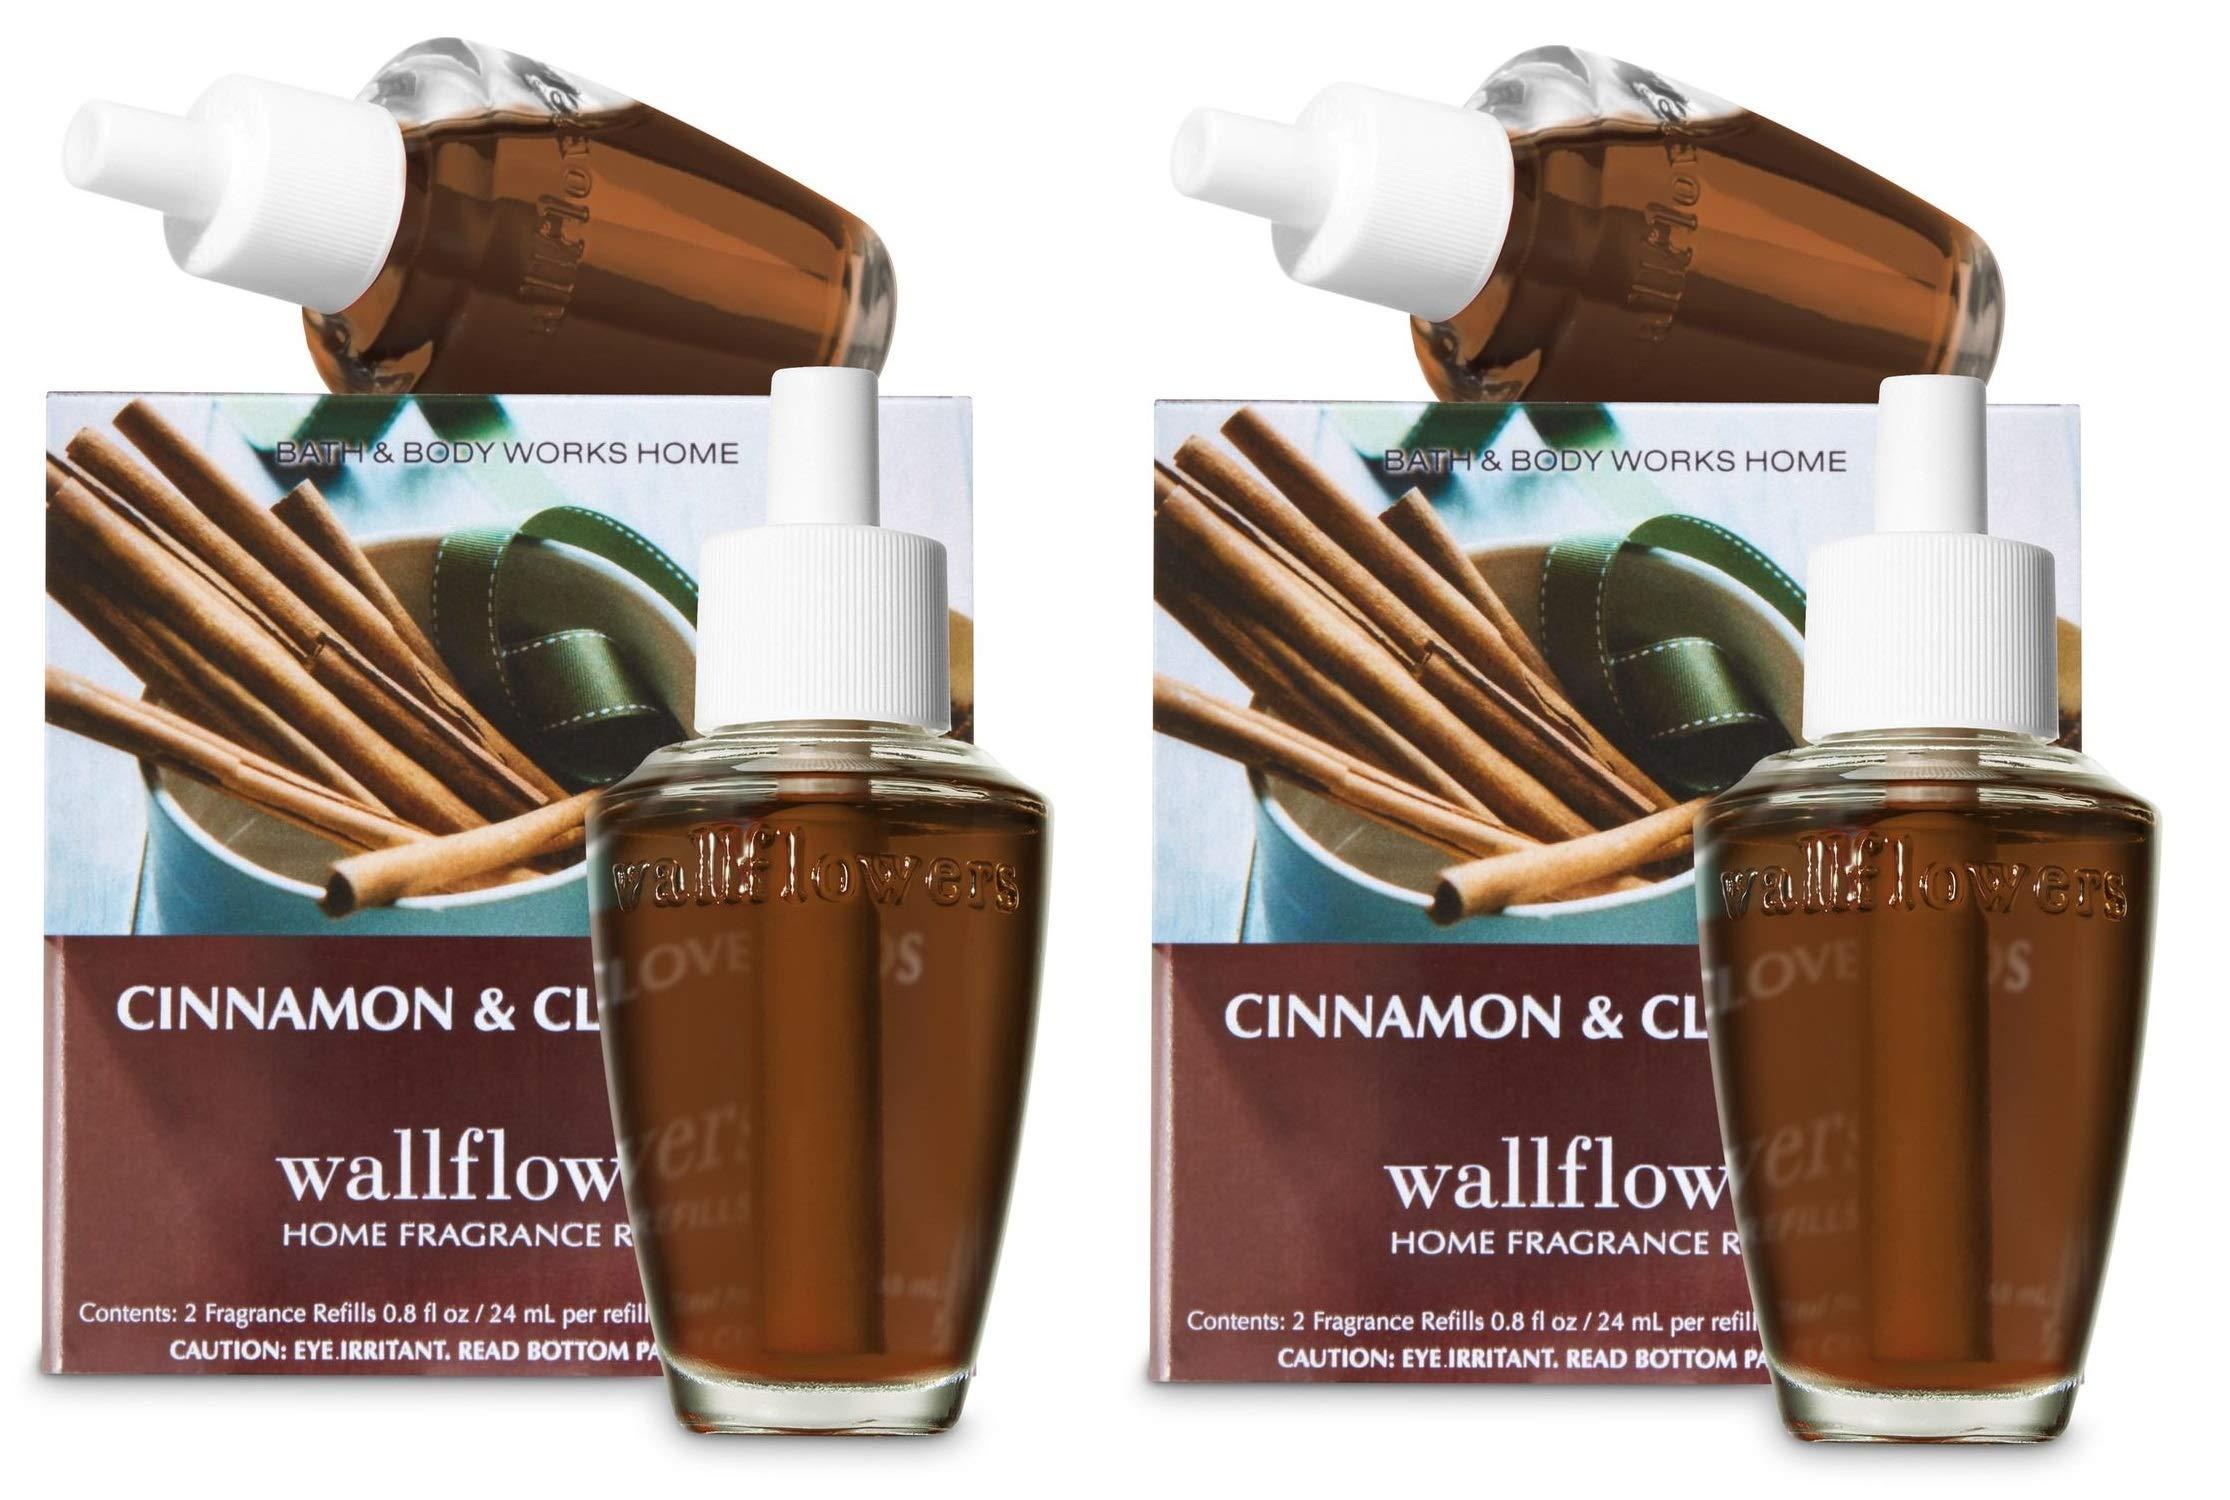 Bath & Body Works Wallflower Bulb Refills - Cinnamon & Clove Buds - FOUR bulbs! by Bath & Body Works (Image #1)